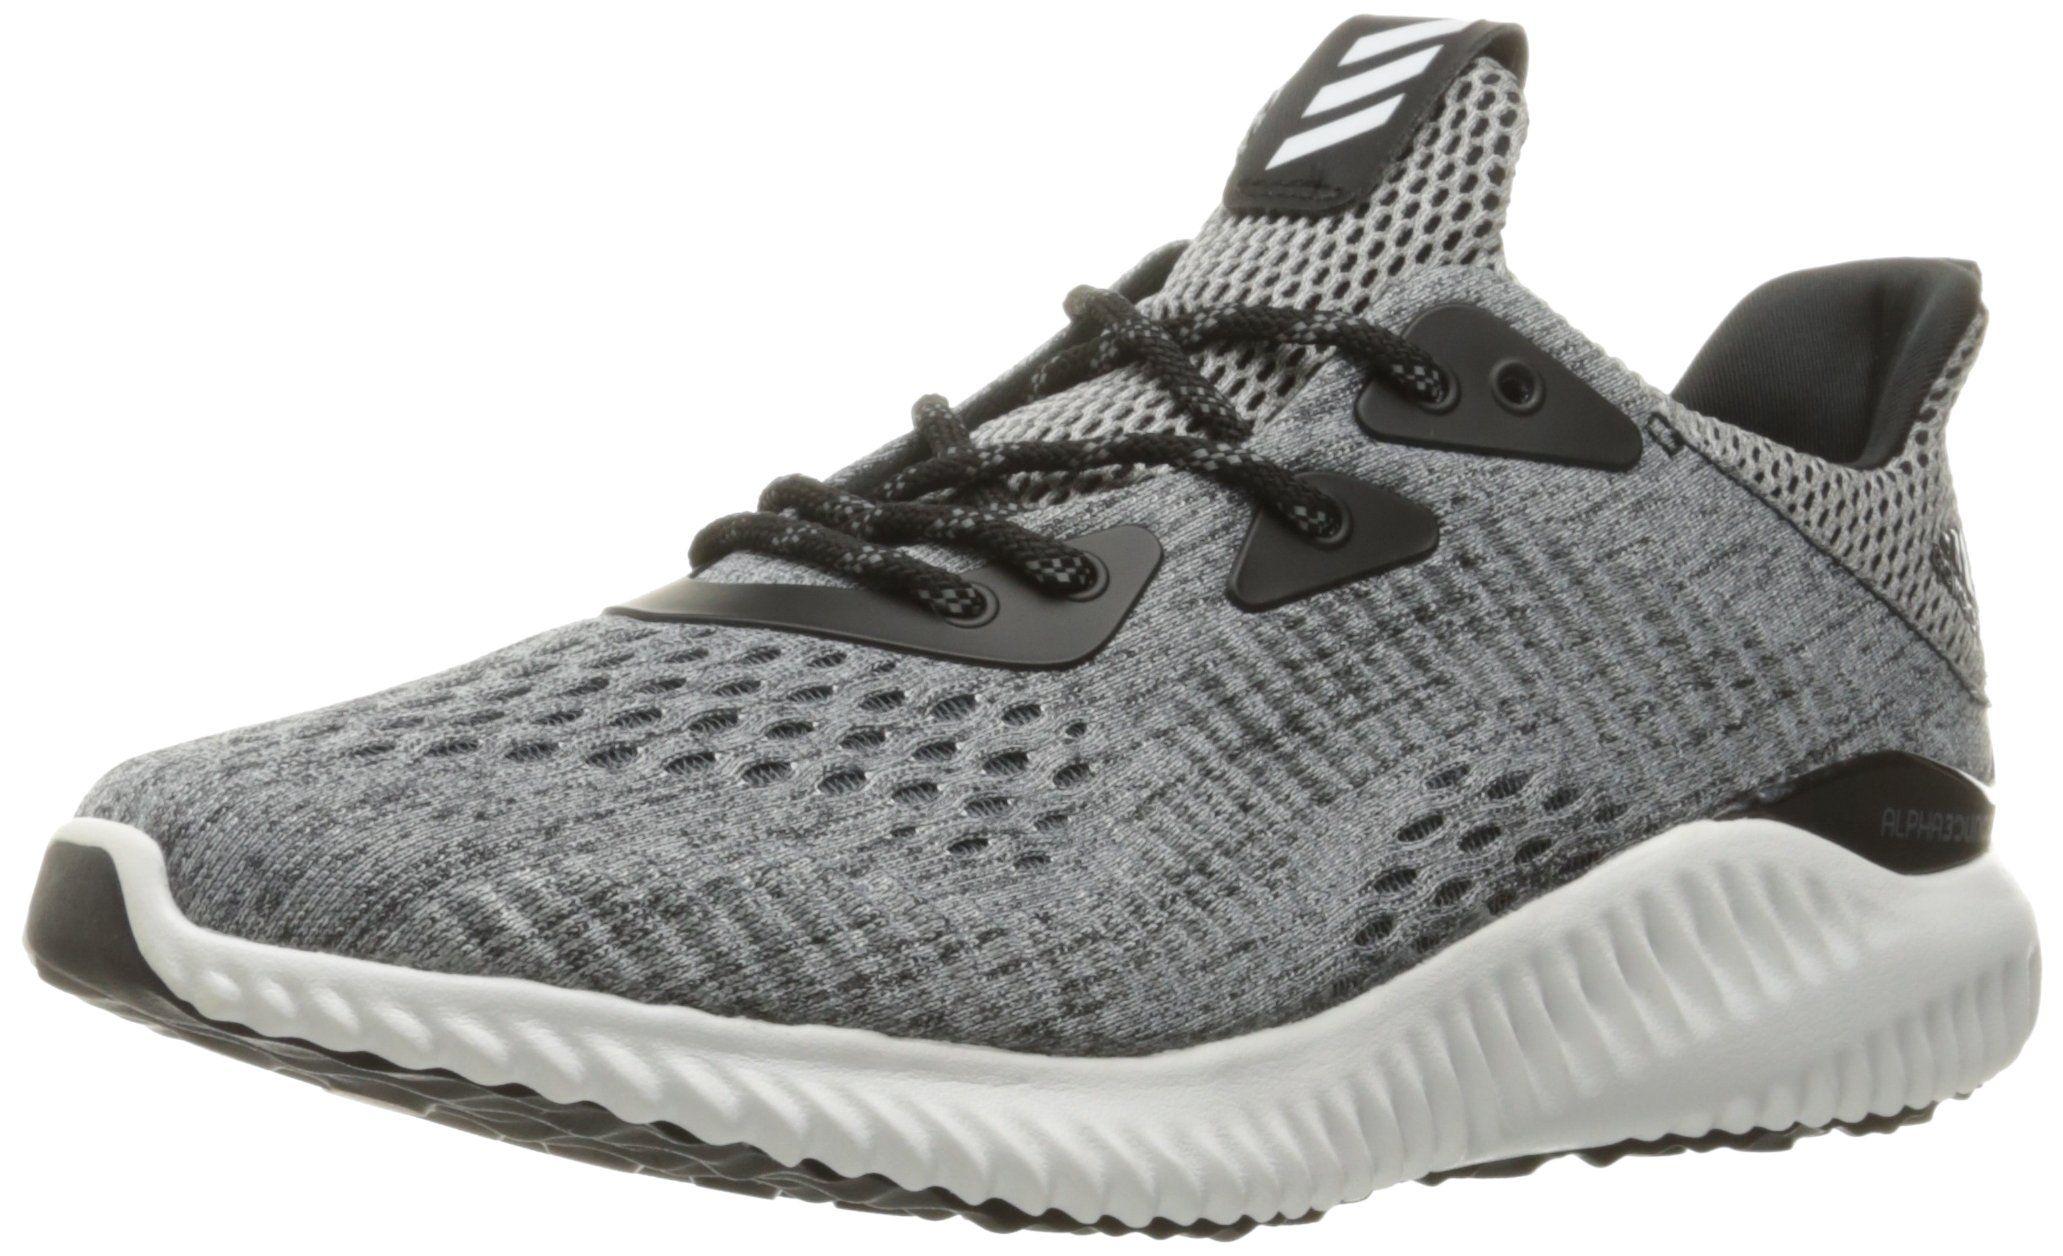 low priced 6d65b b5aaa adidas Performance Women s Alphabounce EM W Running Shoe,  Black White Black, 7.5